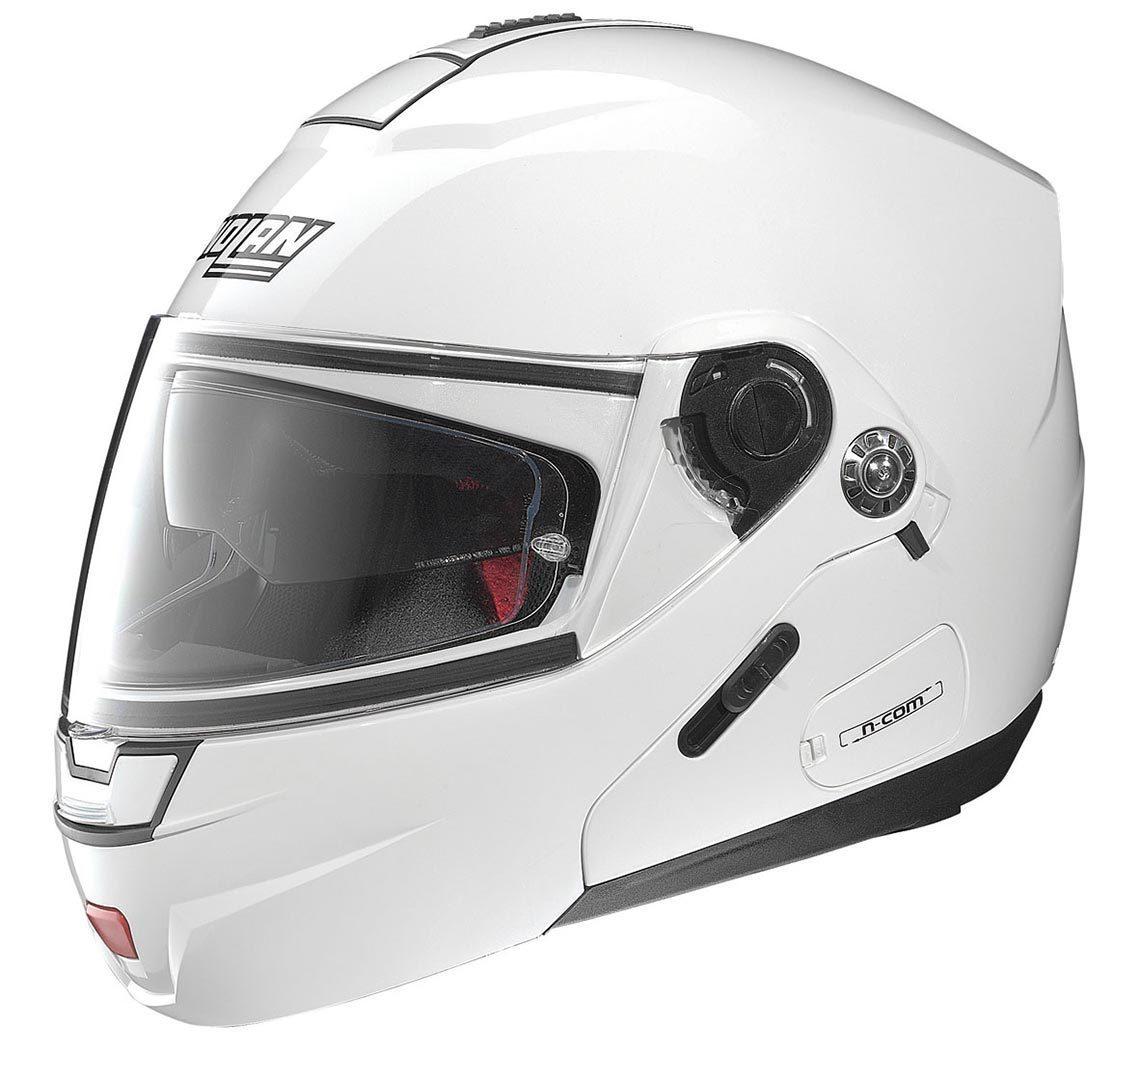 Capacete Nolan N91 Evo Classic Branco Escamoteável C/ Viseira Solar Interna - Ganhe Balaclava Exclusiva!  - Nova Suzuki Motos e Acessórios